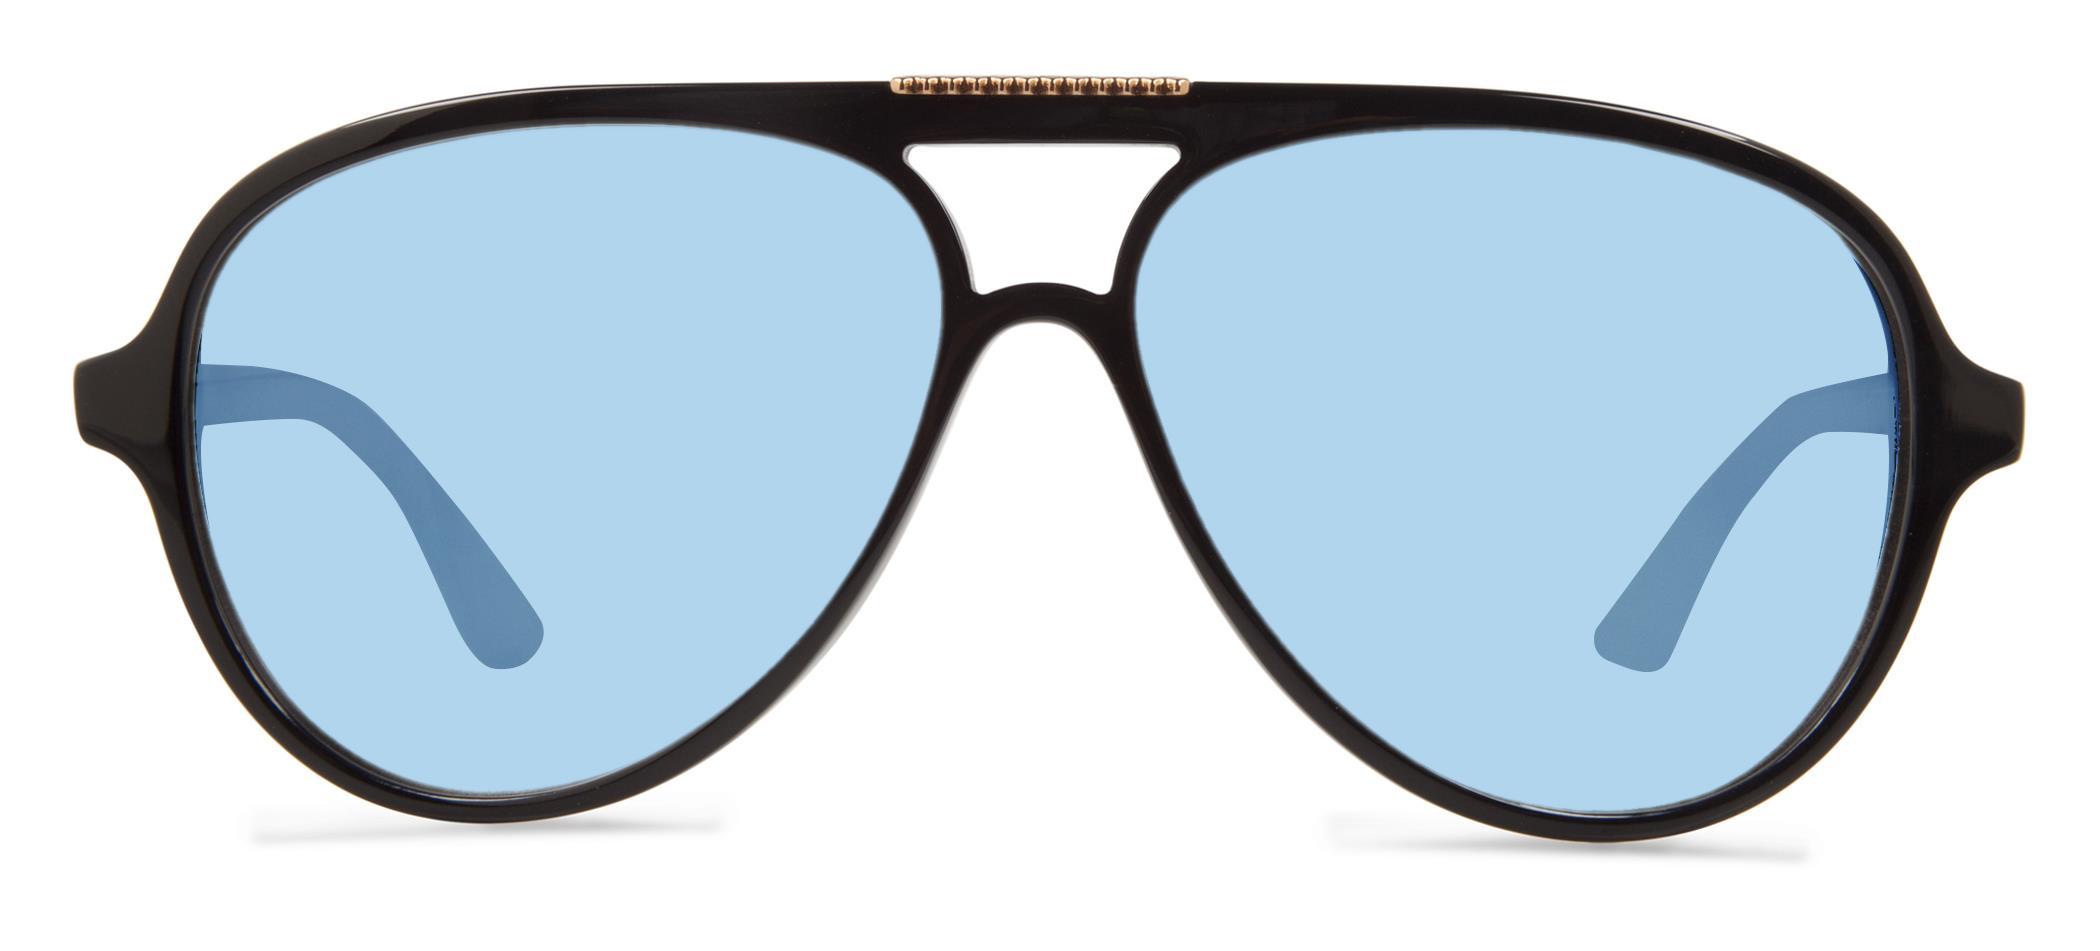 62f9aea214 New REVO RE 1015 01 GBL PHOENIX Sunglasses Black Blue Water Polarized  Aviator